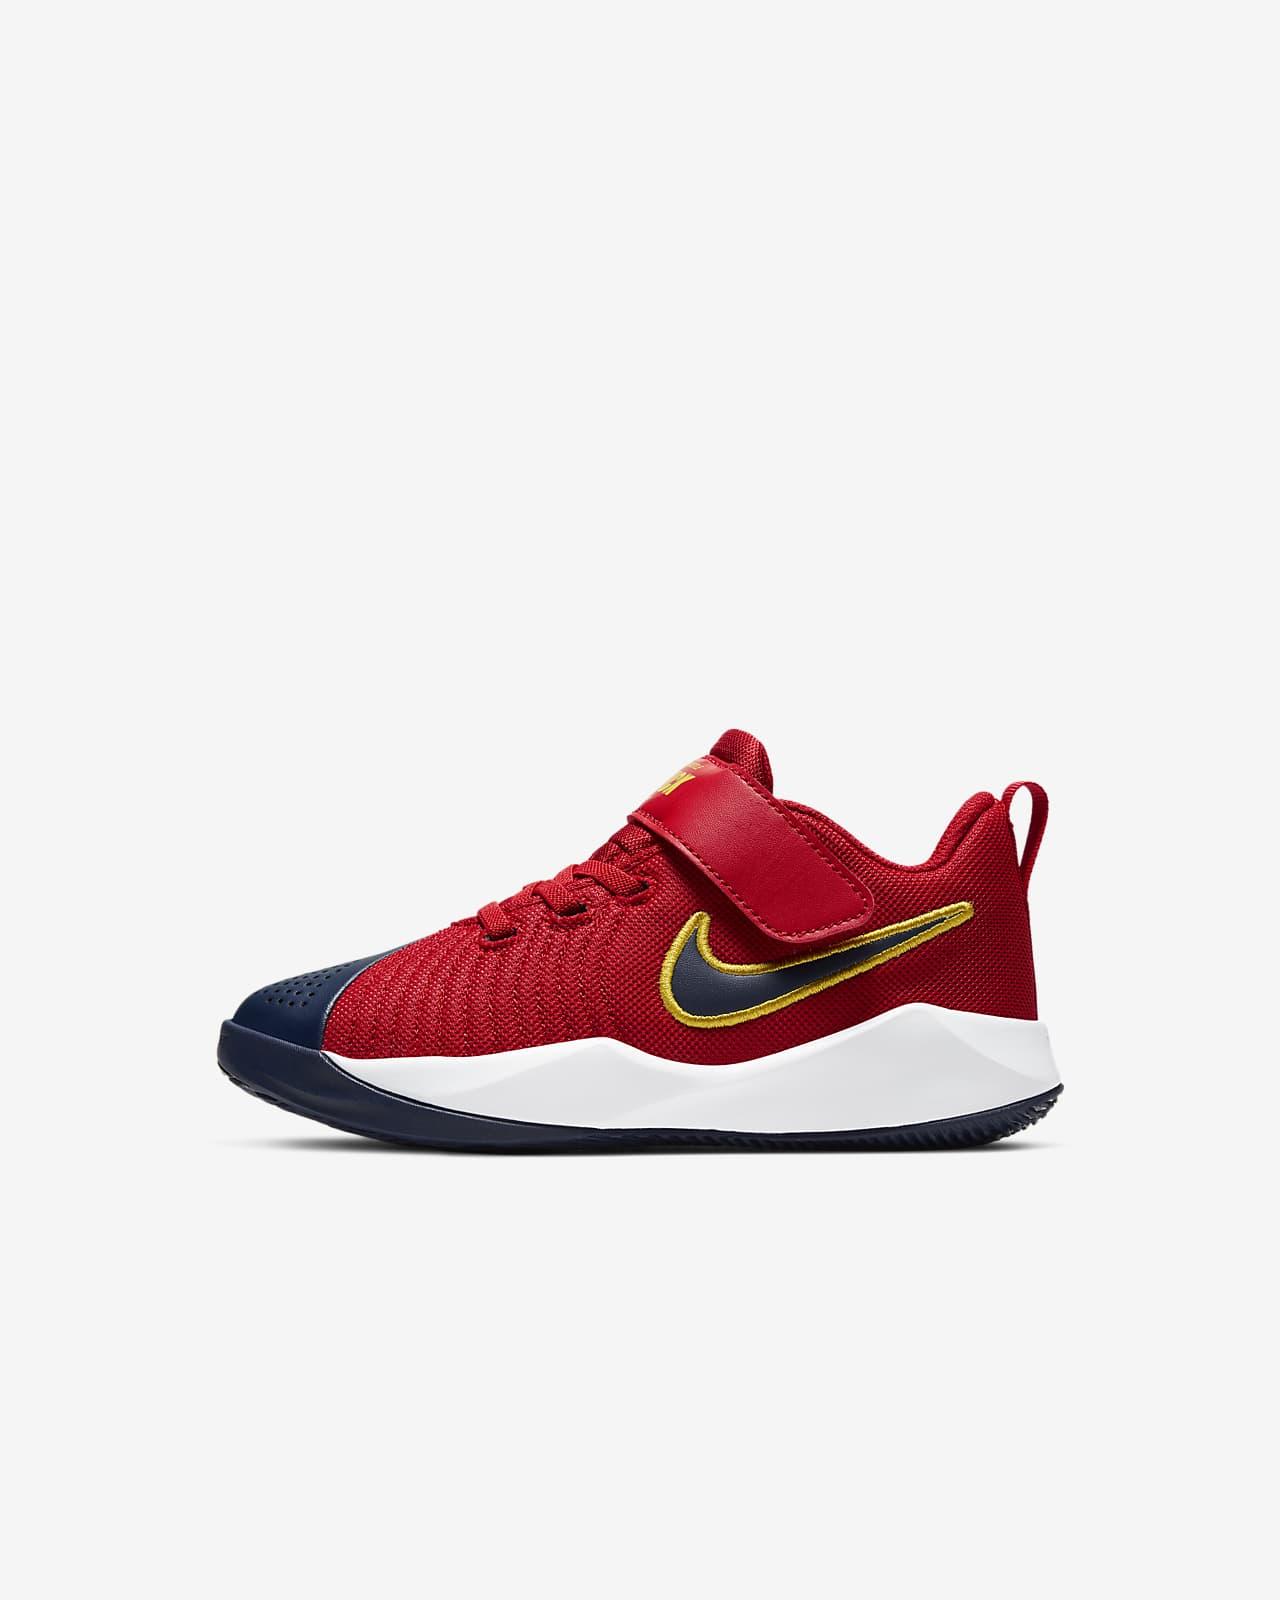 Nike Team Hustle Quick 2 Younger Kids' Shoe